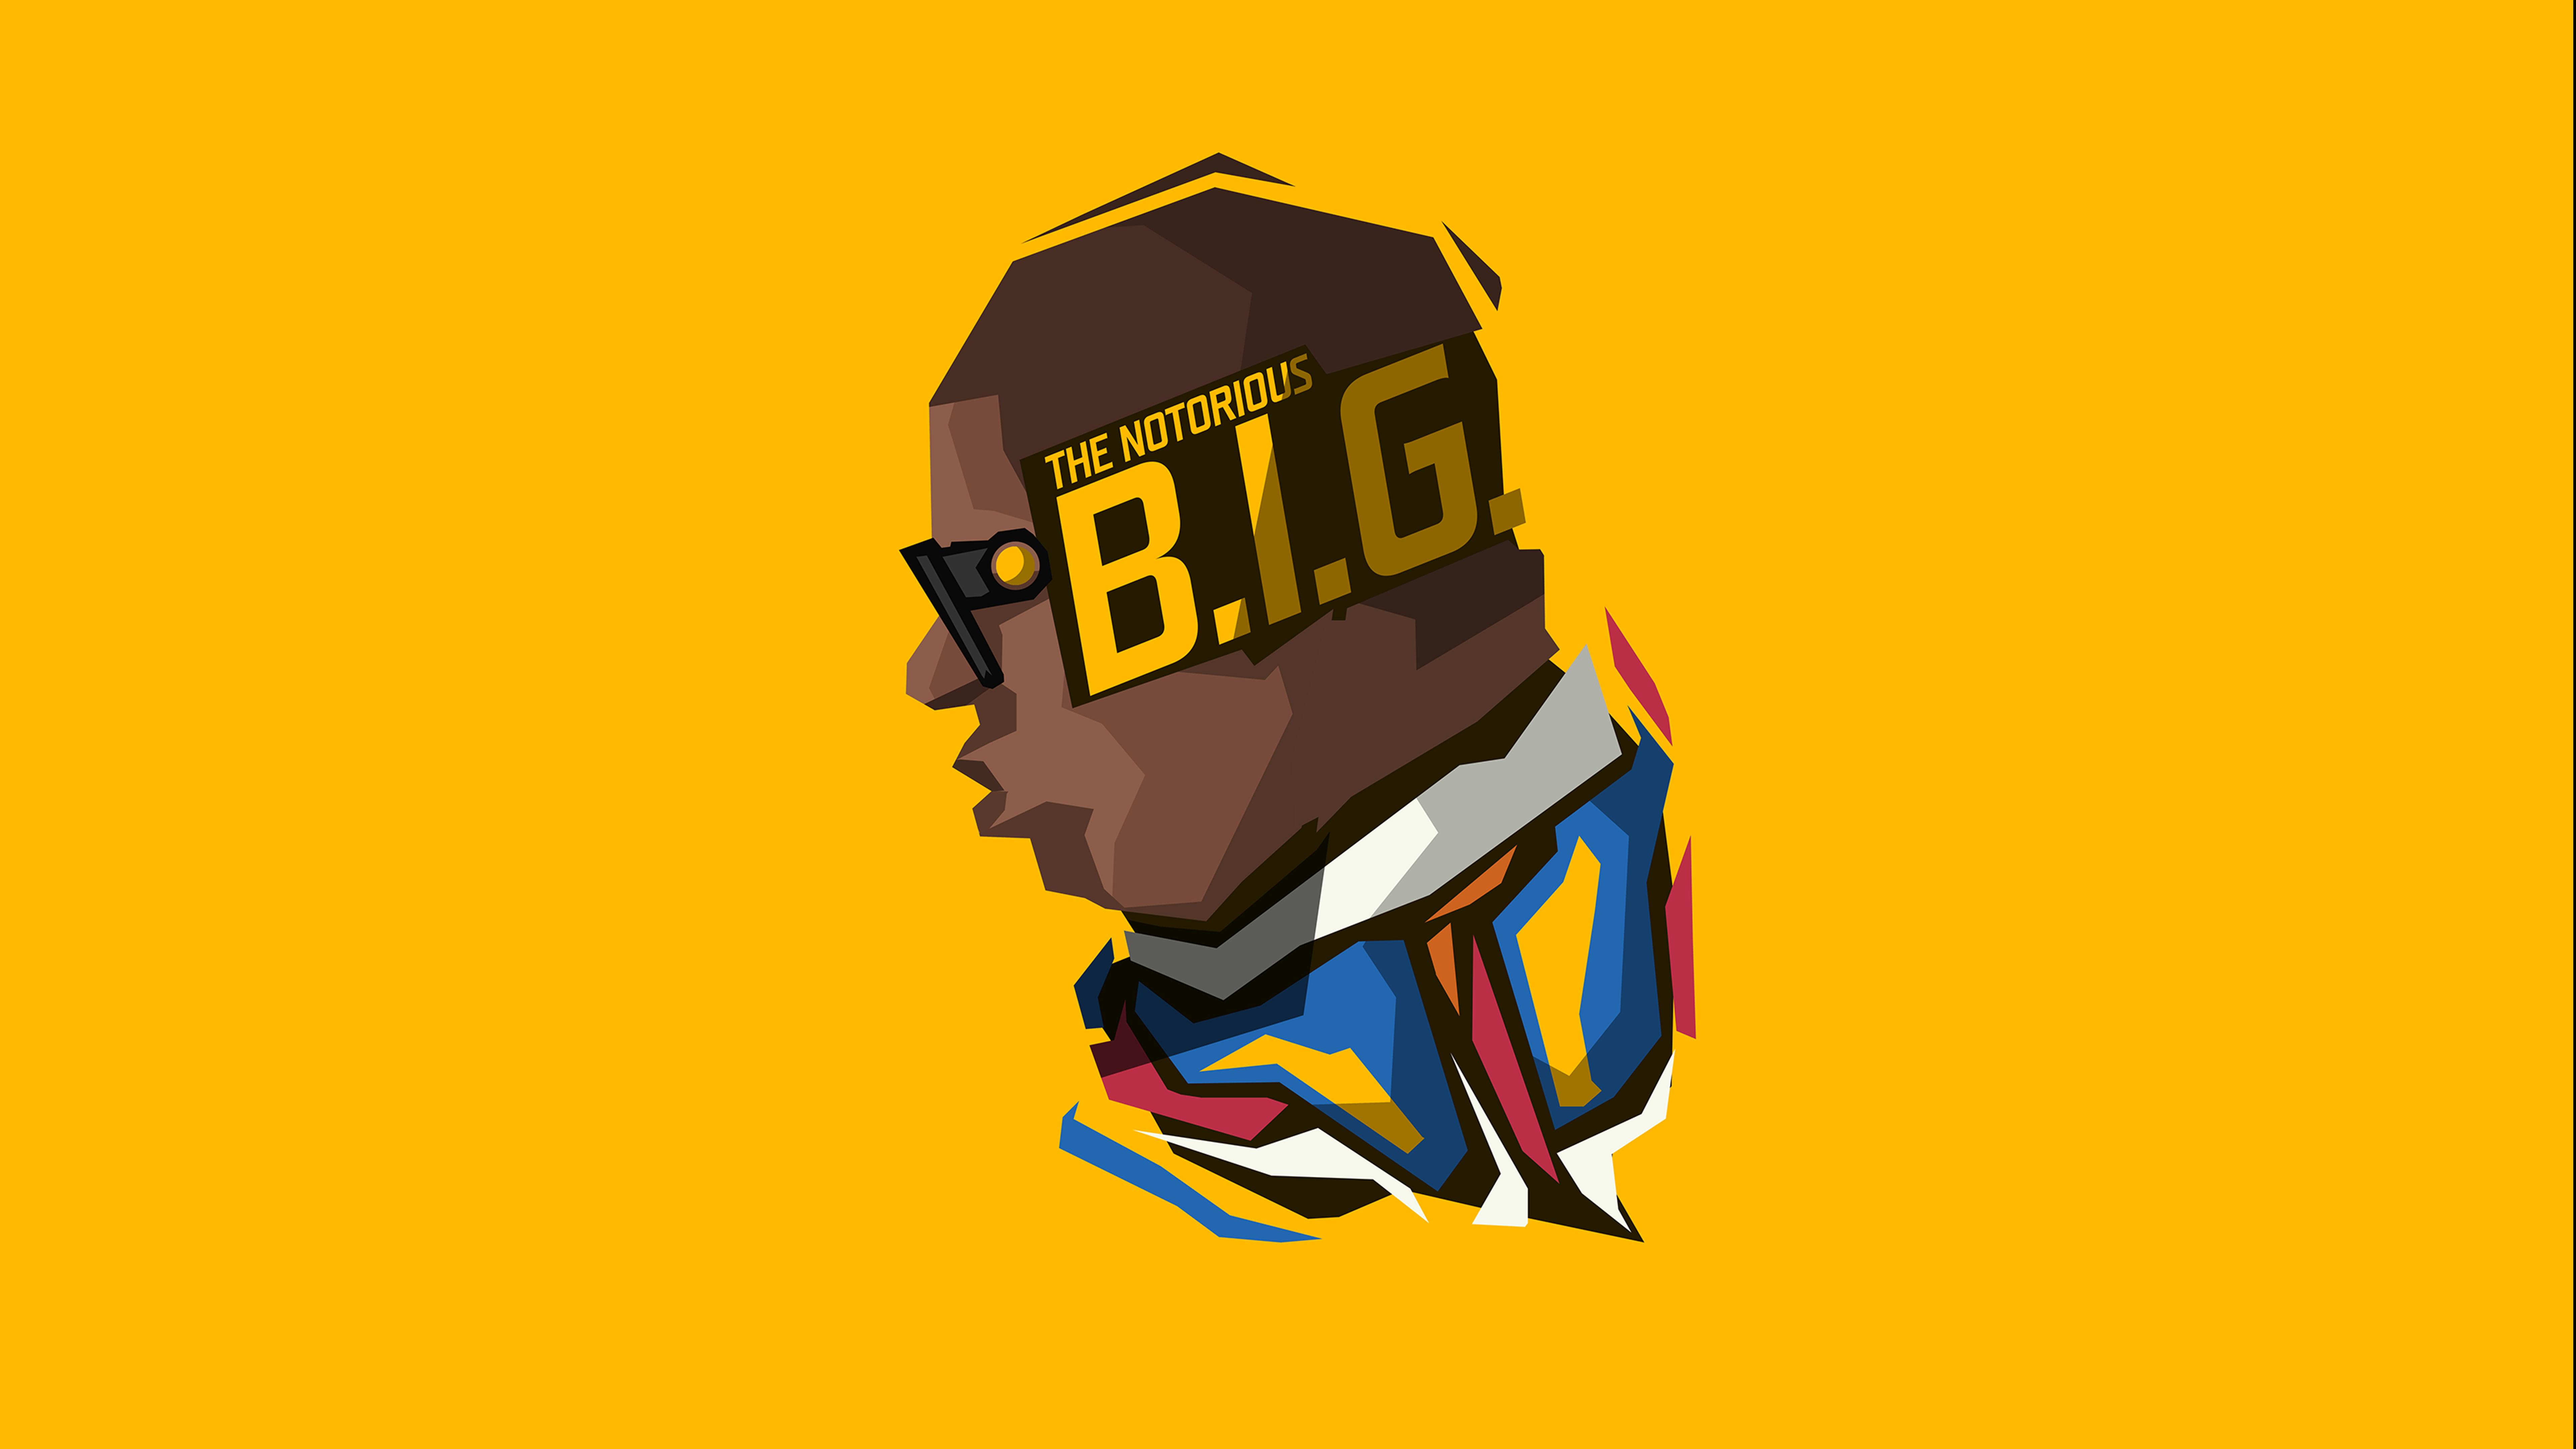 The Notorious BIG Bakgrundsbilder ID937387